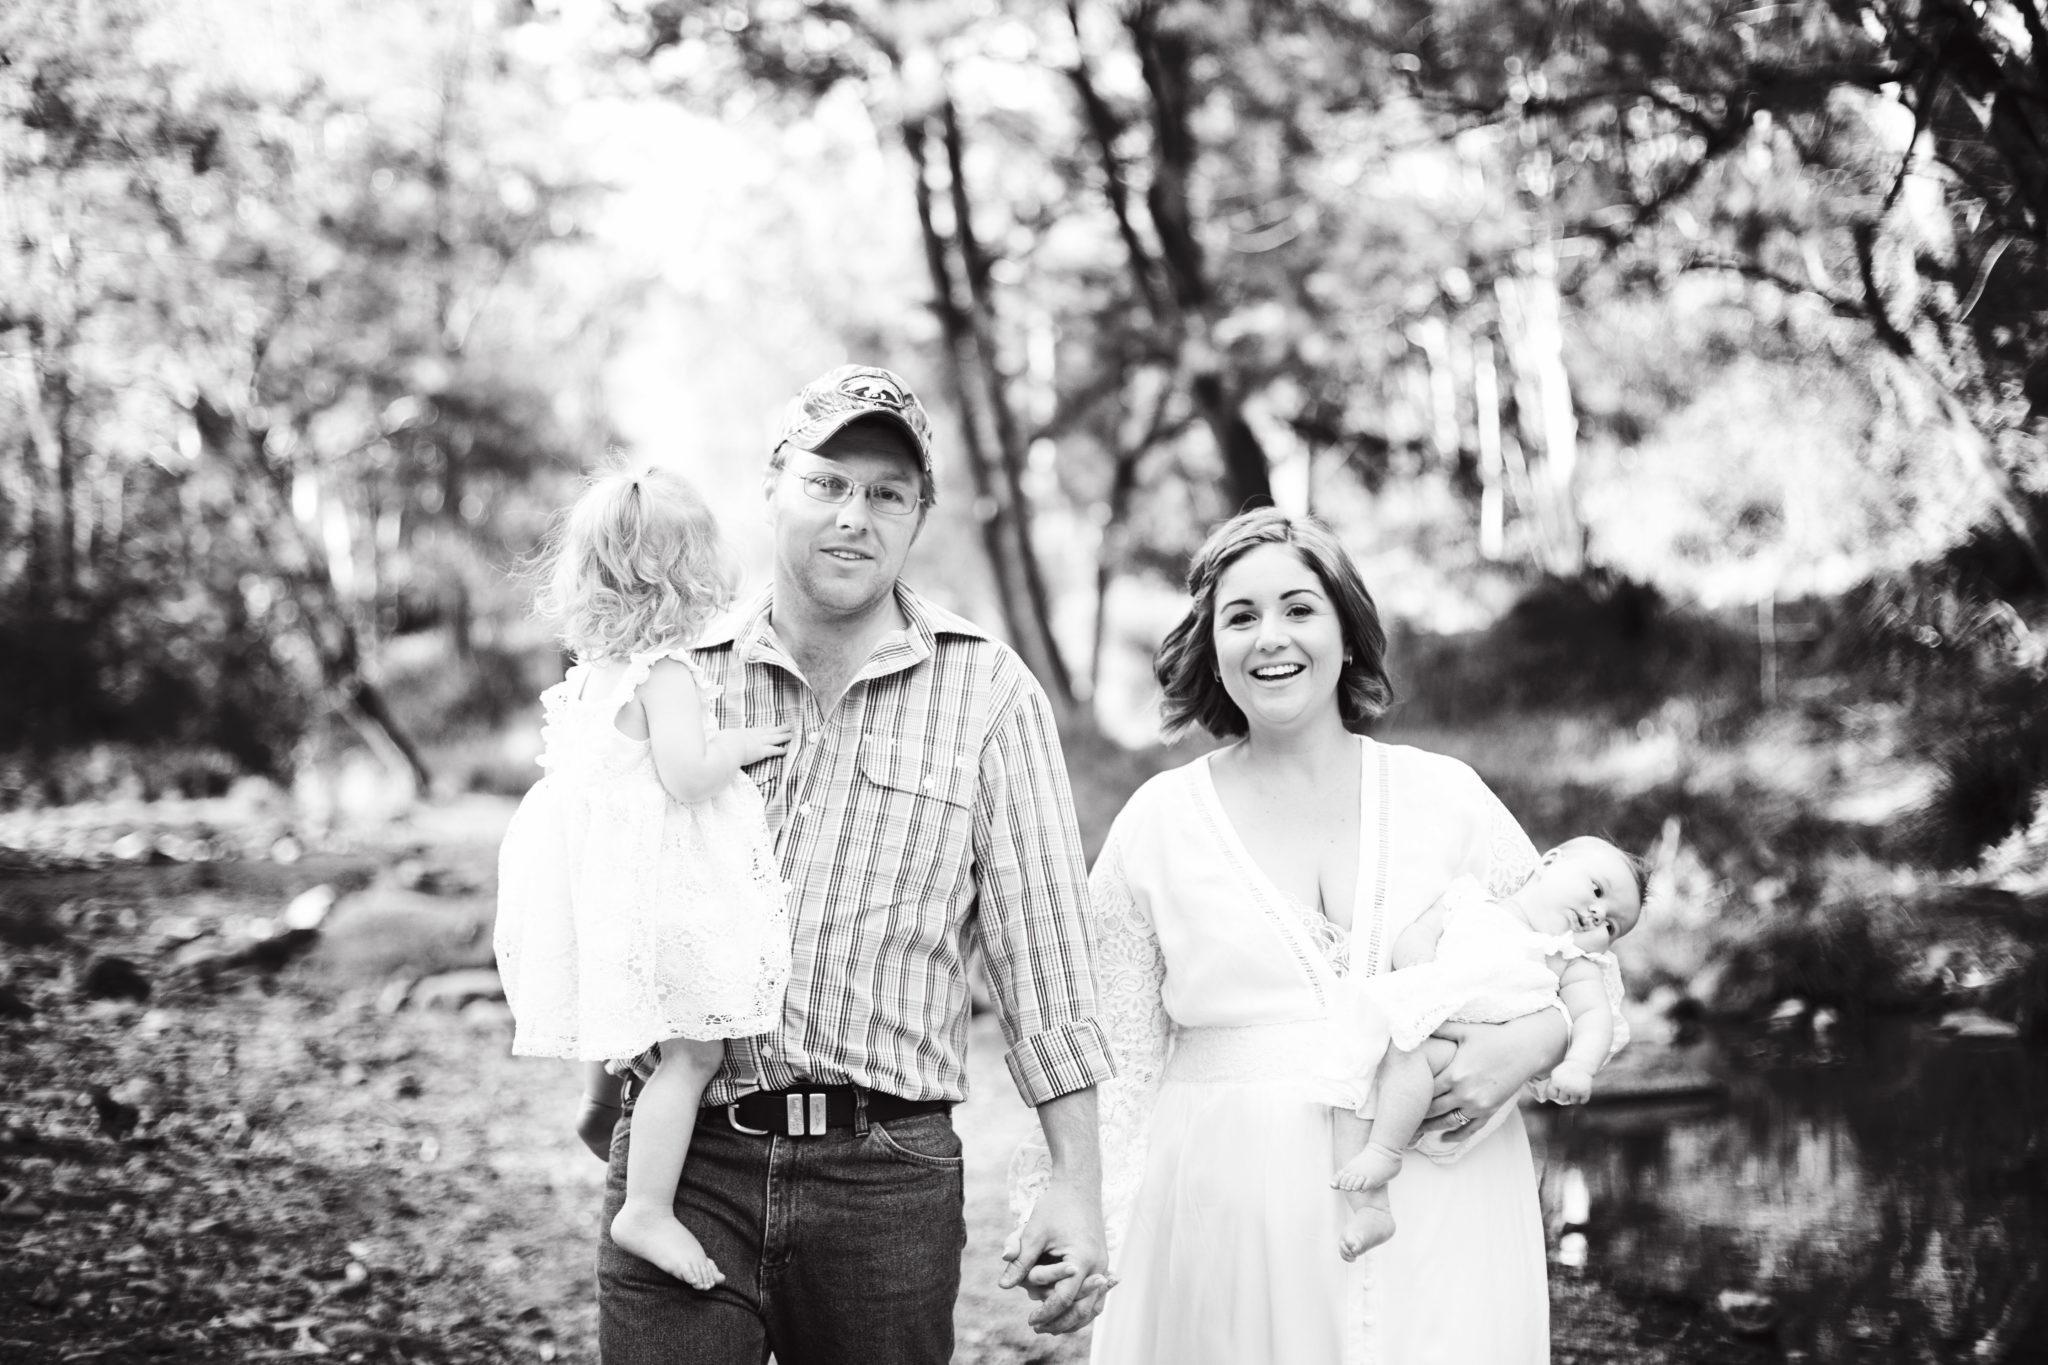 Warwick Family Photographer, Family Photographer Warwick